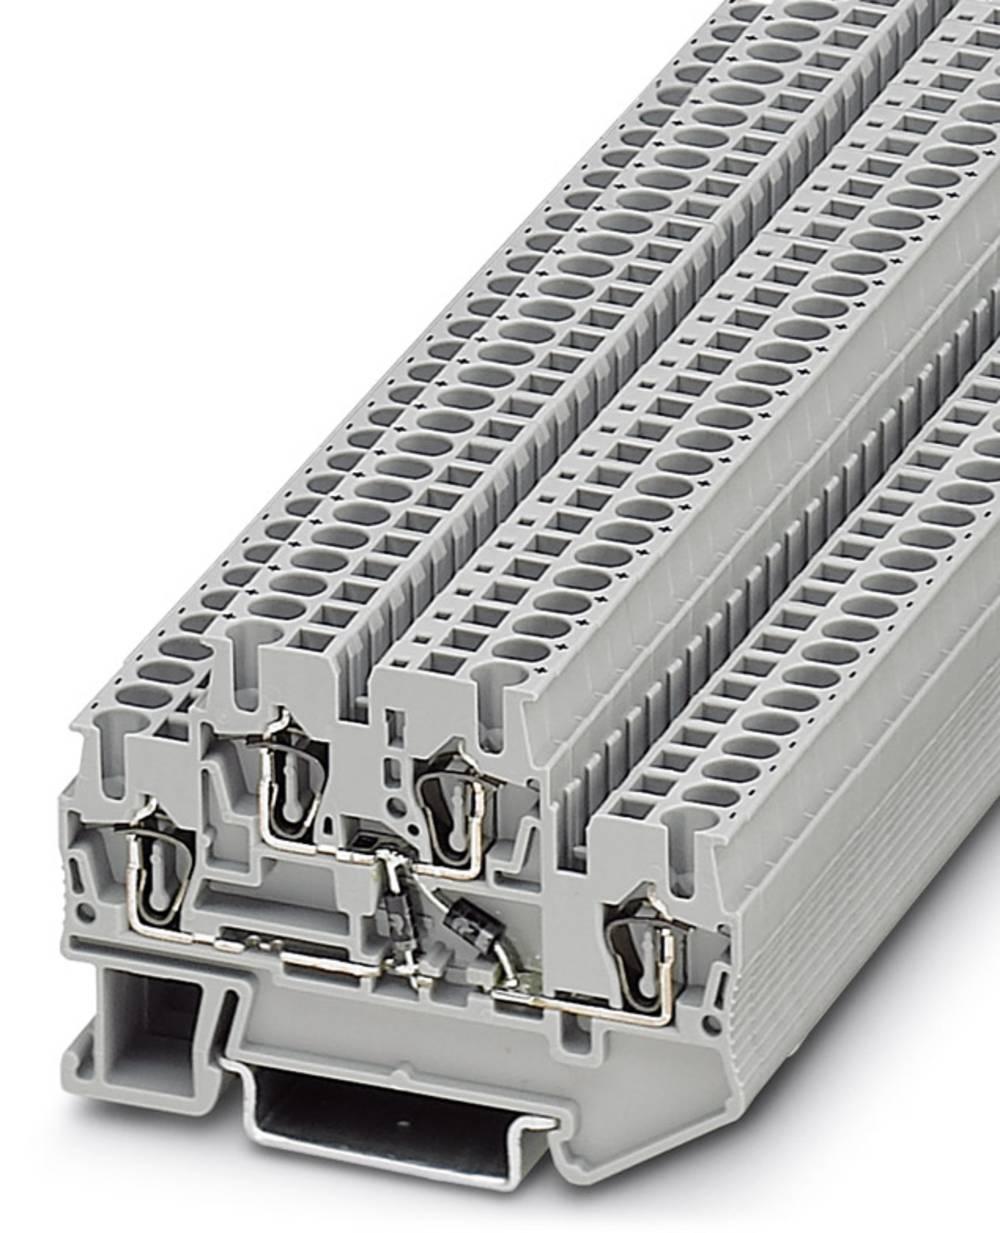 Komponent terminal STTB 2,5-2DIO / O UL / UL-UR Phoenix Contact STTB 2,5-2DIO/O-UL/UL-UR Grå 50 stk